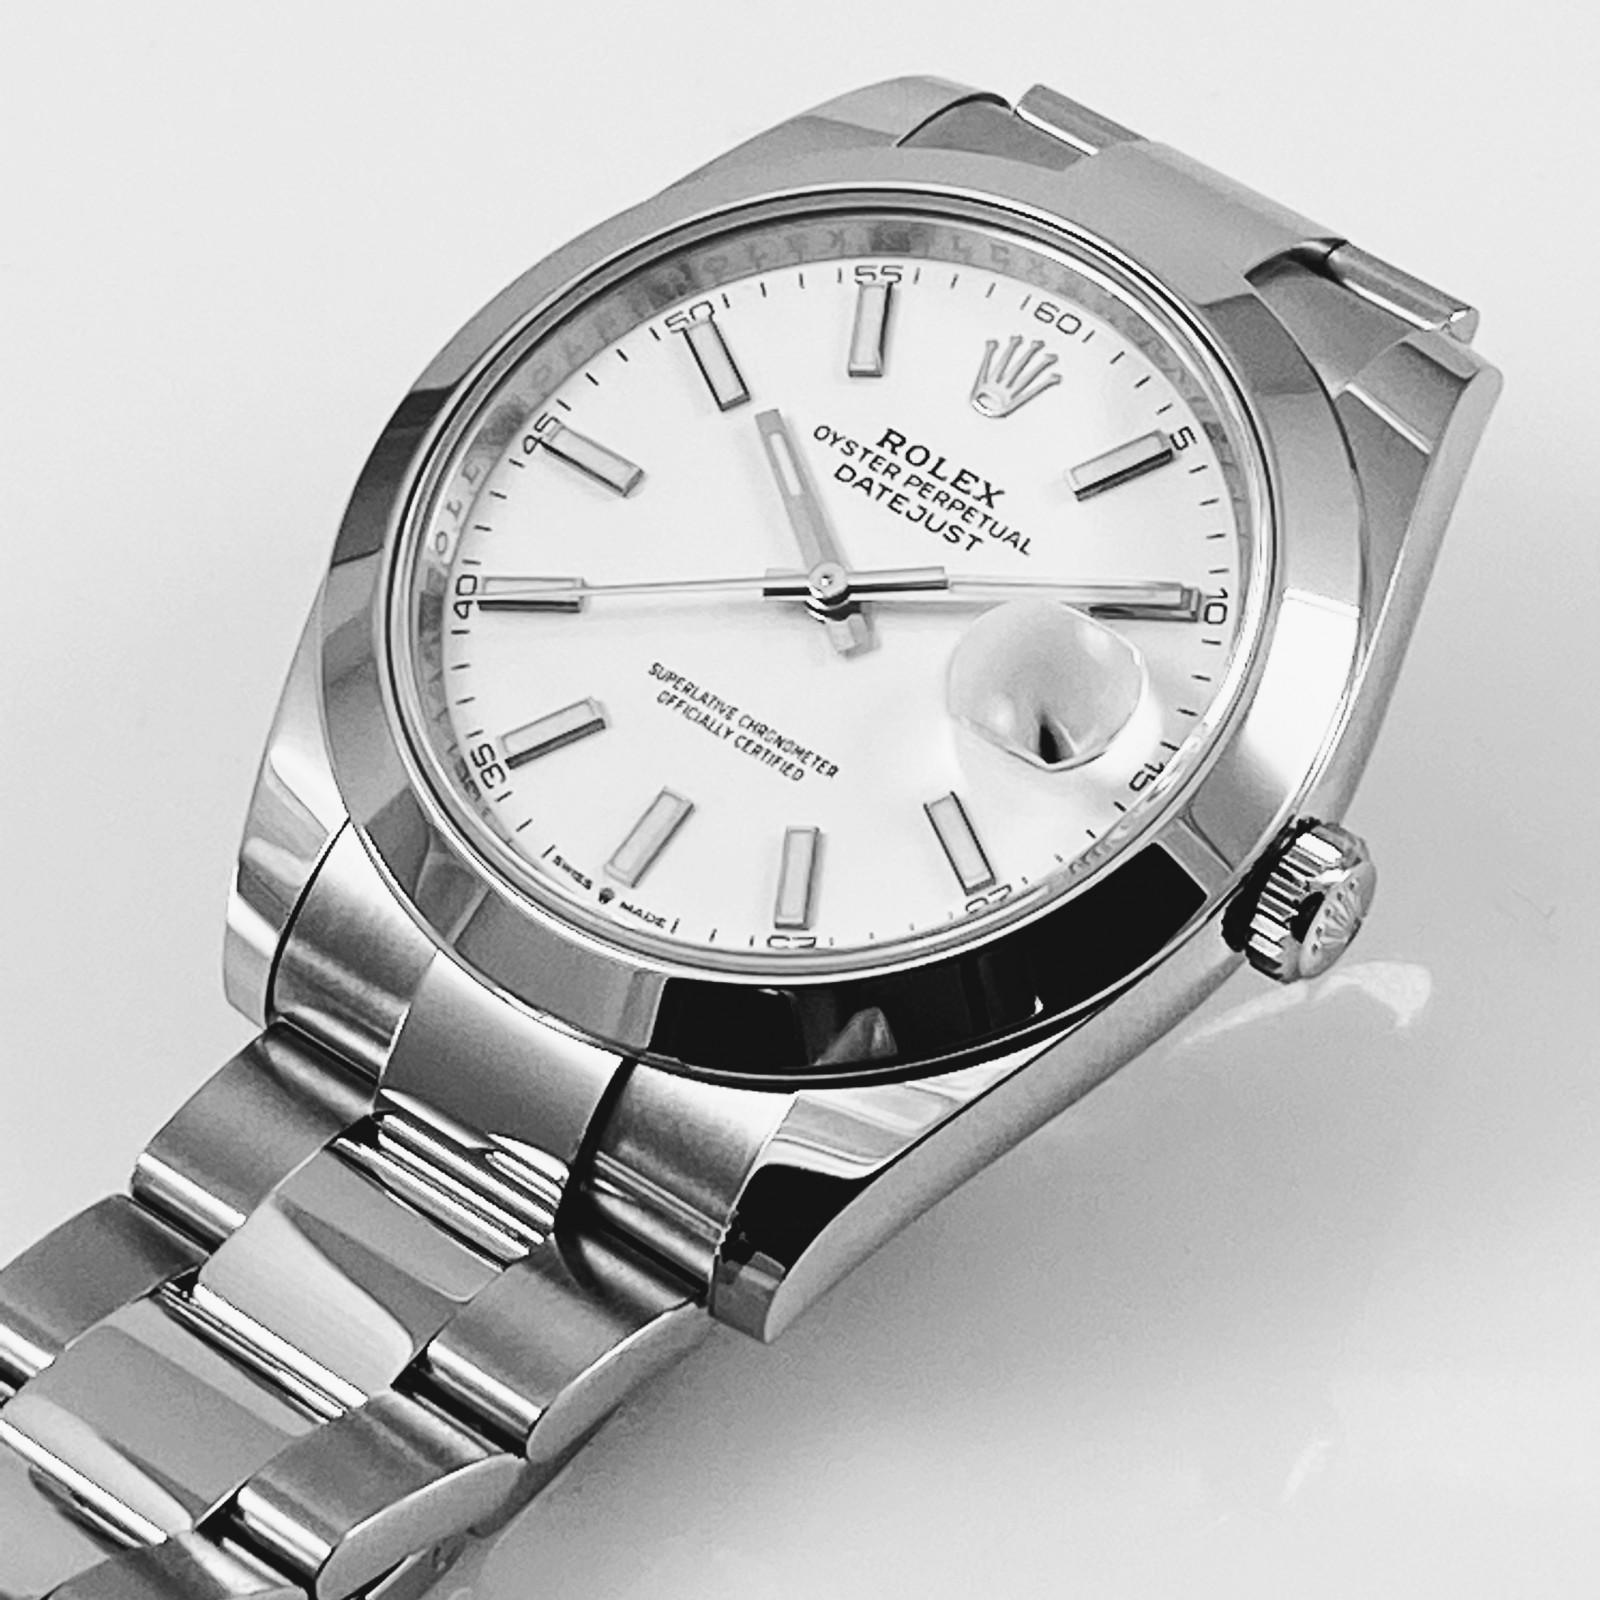 Rolex Datejust 126300 Big Face 41 mm